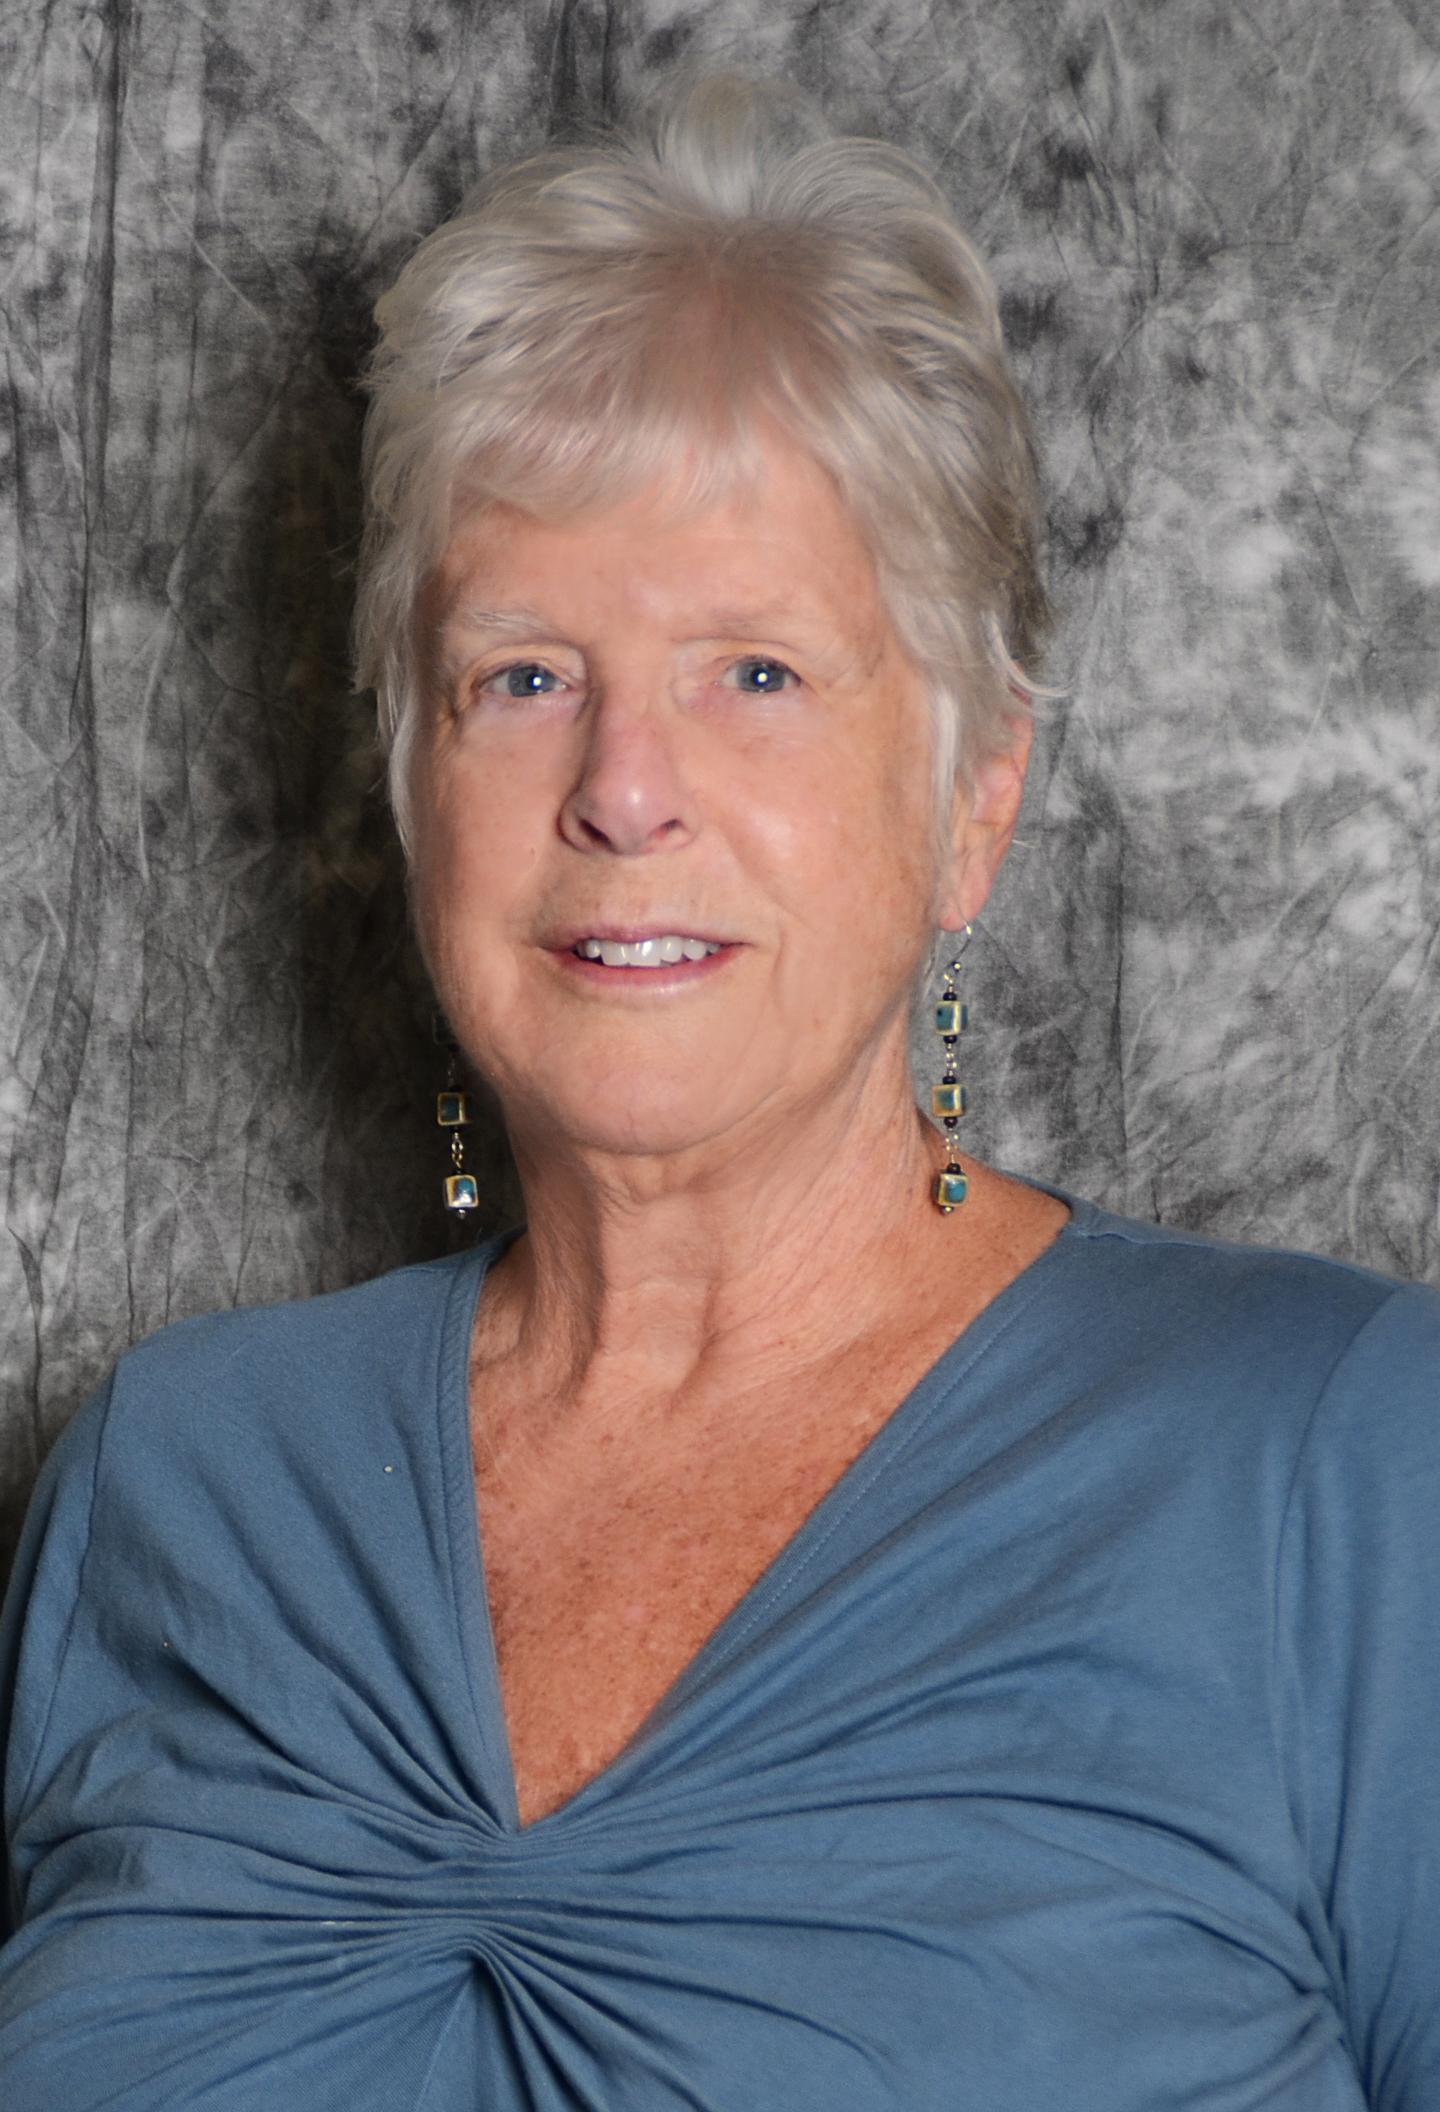 Carol Reinert, MA, LMHC